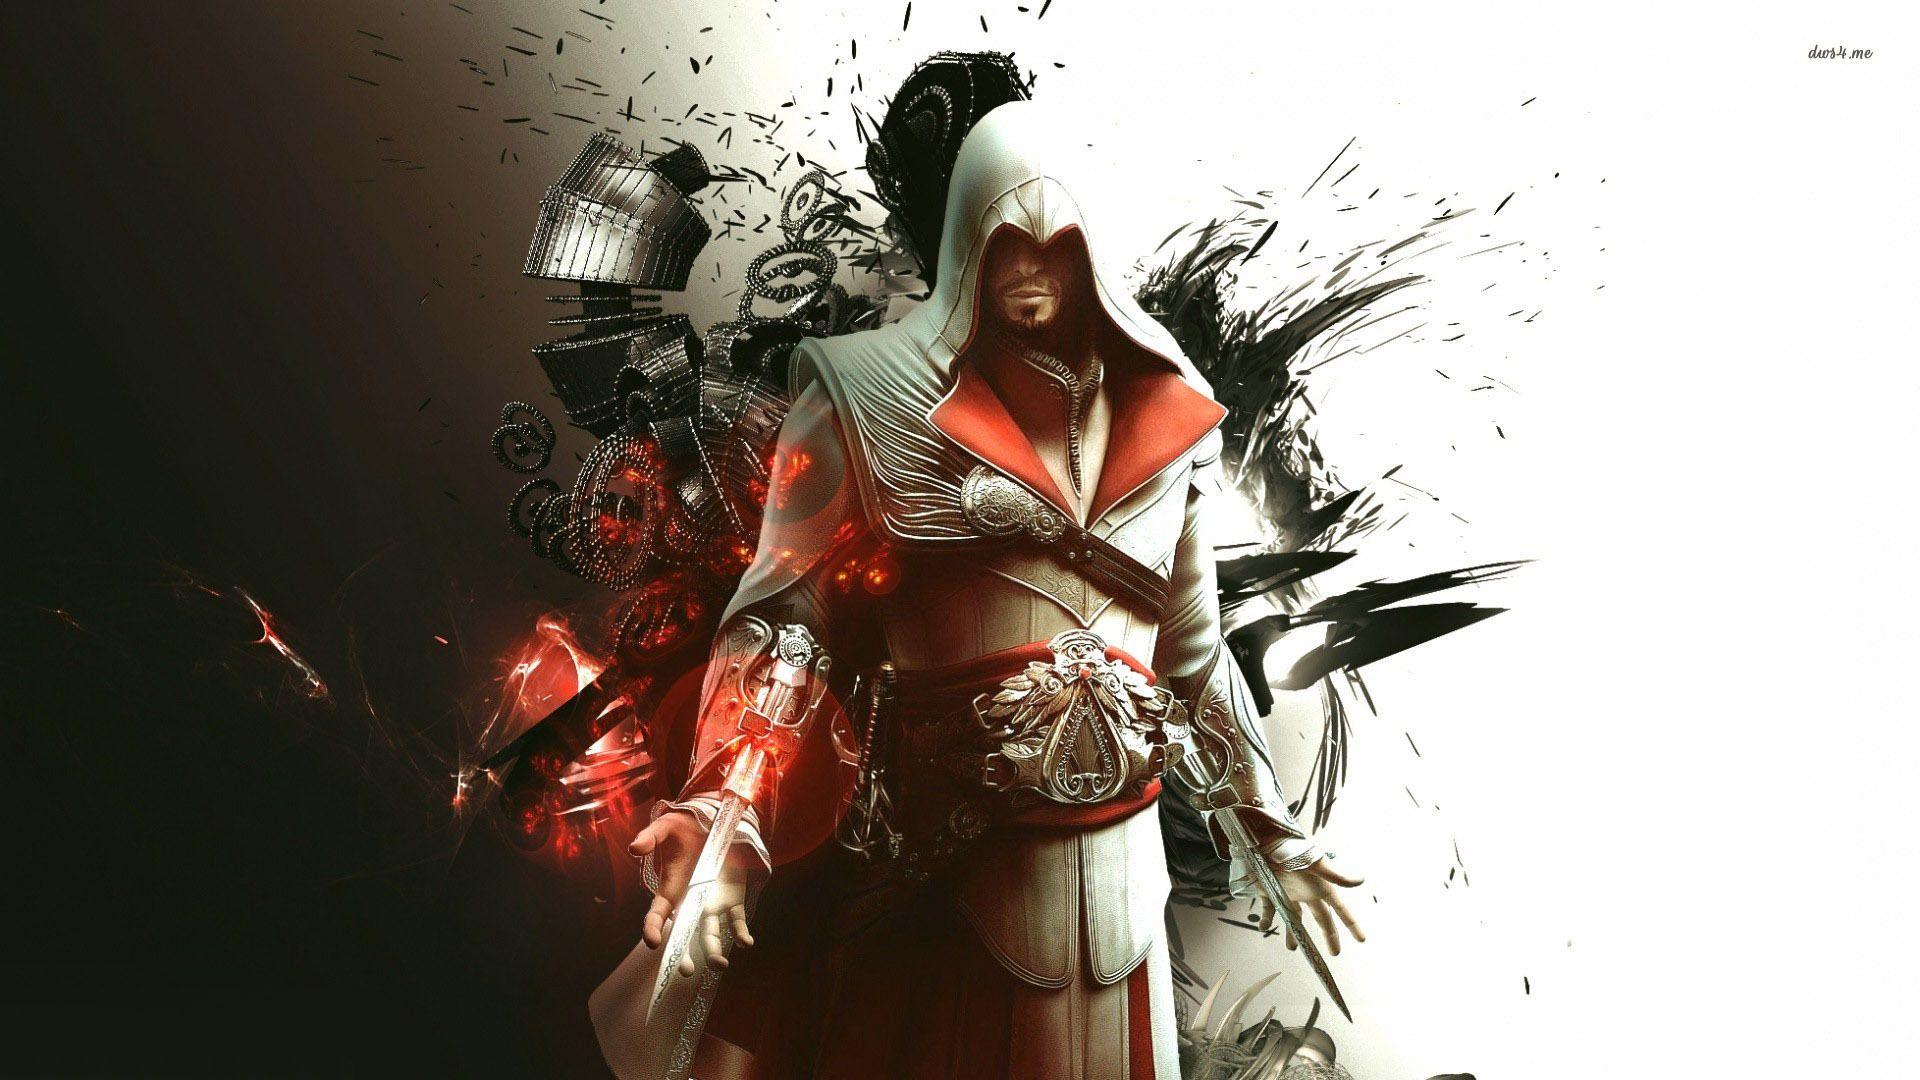 Ezio Assassin S Creed Brotherhood Hd Wallpaper Assassin S Creed Brotherhood Assassins Creed Assassin S Creed Wallpaper